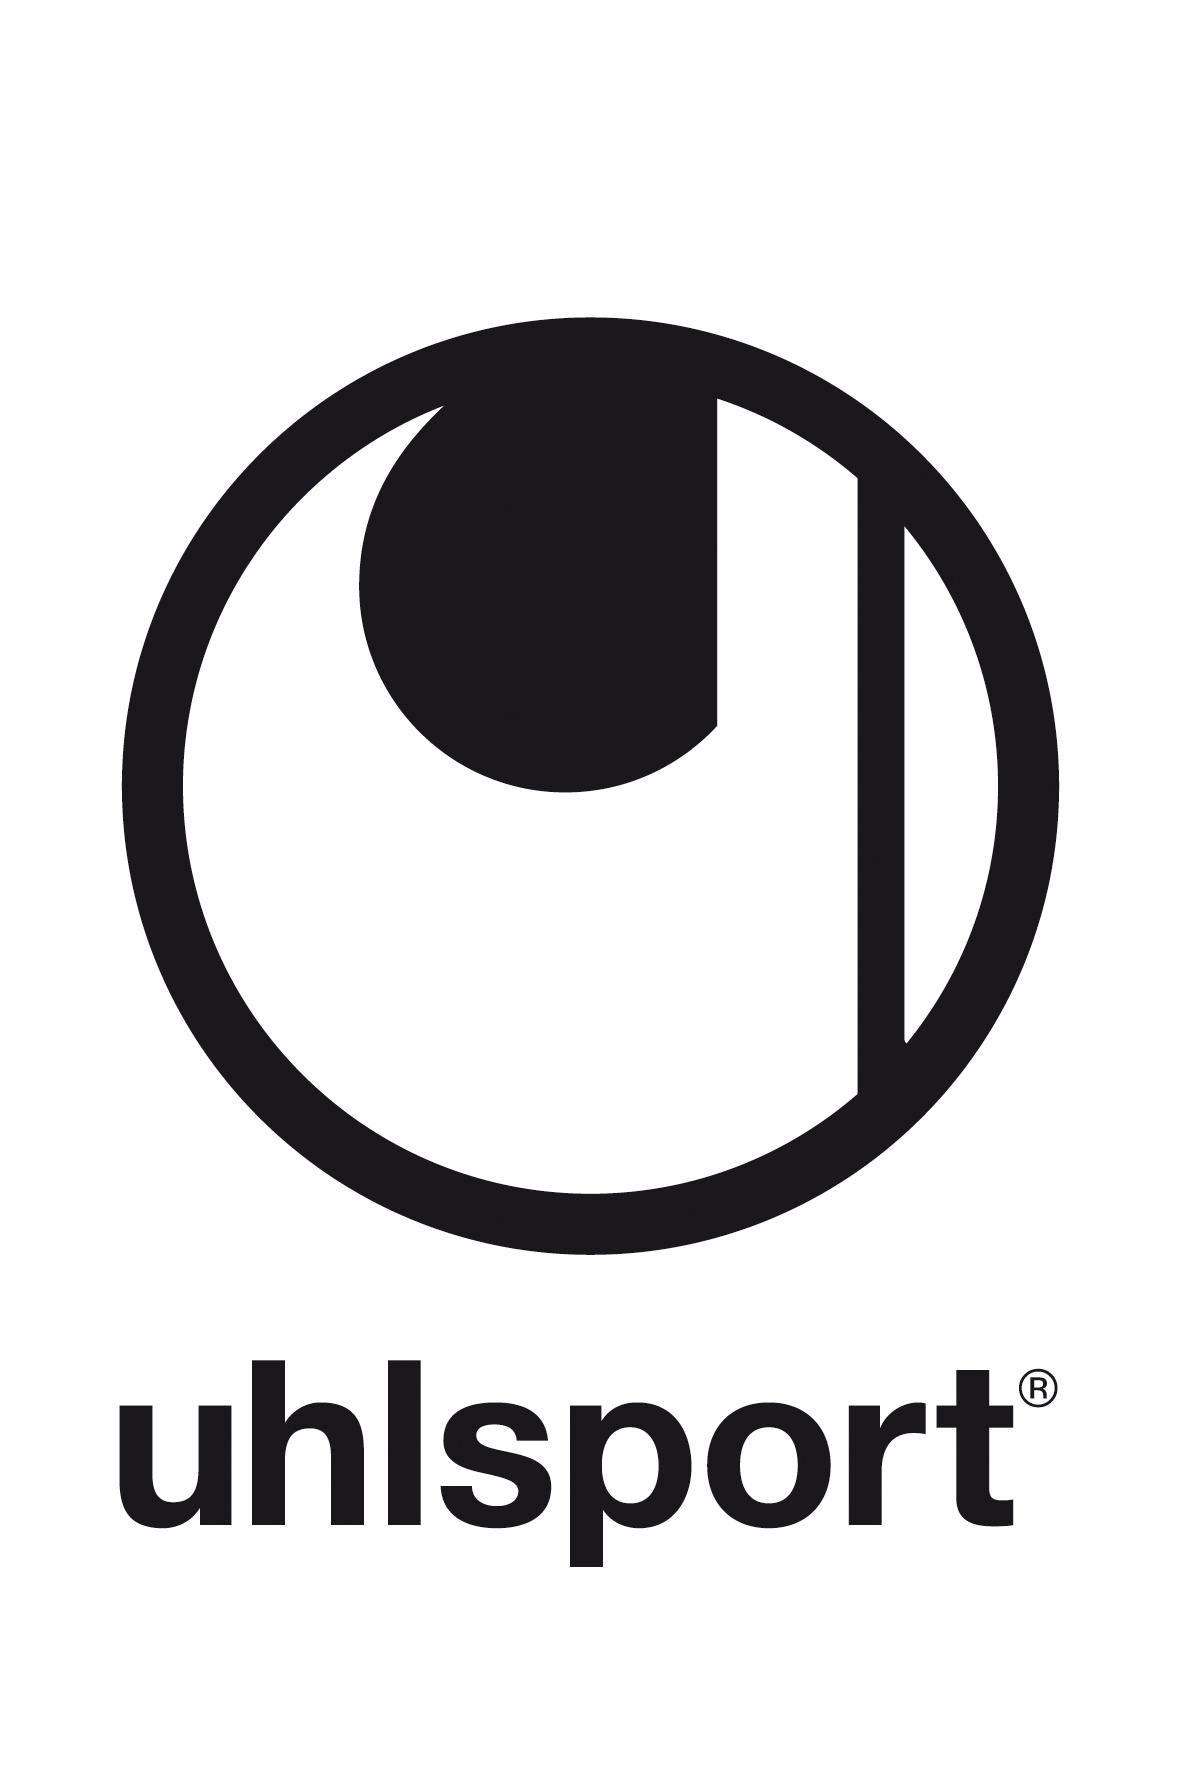 uhlsport_logo_mzone_2016_1c.jpg